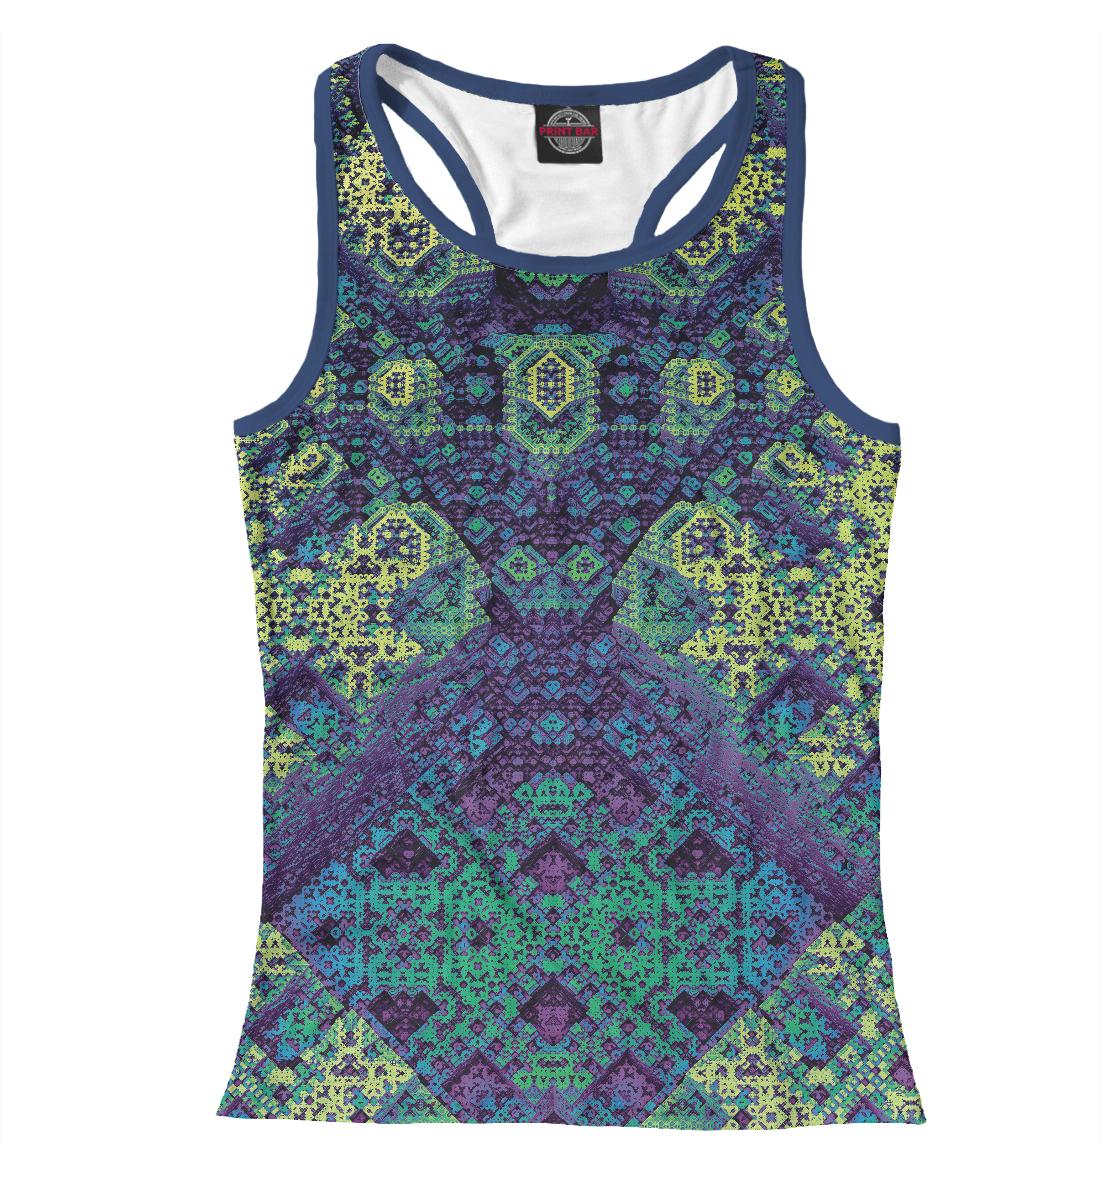 Купить Square fractal, Printbar, Майки борцовки, PSY-774029-mayb-1